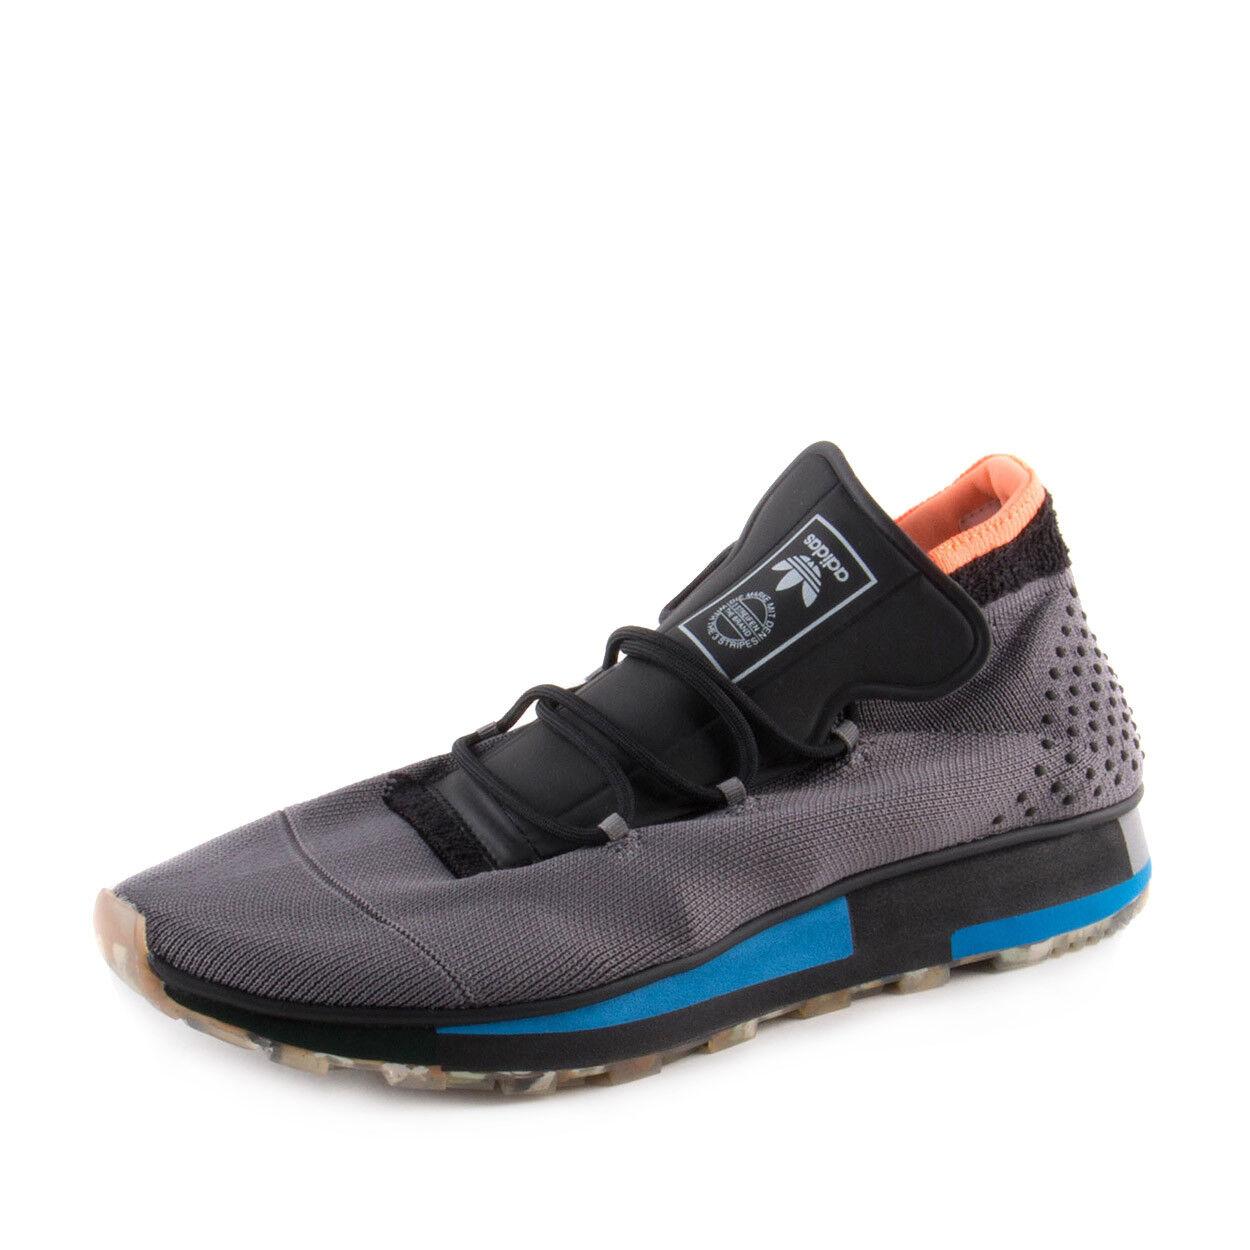 Adidas Mens Alexander Wang AW Run Mid St Crag/Cblack AC6844